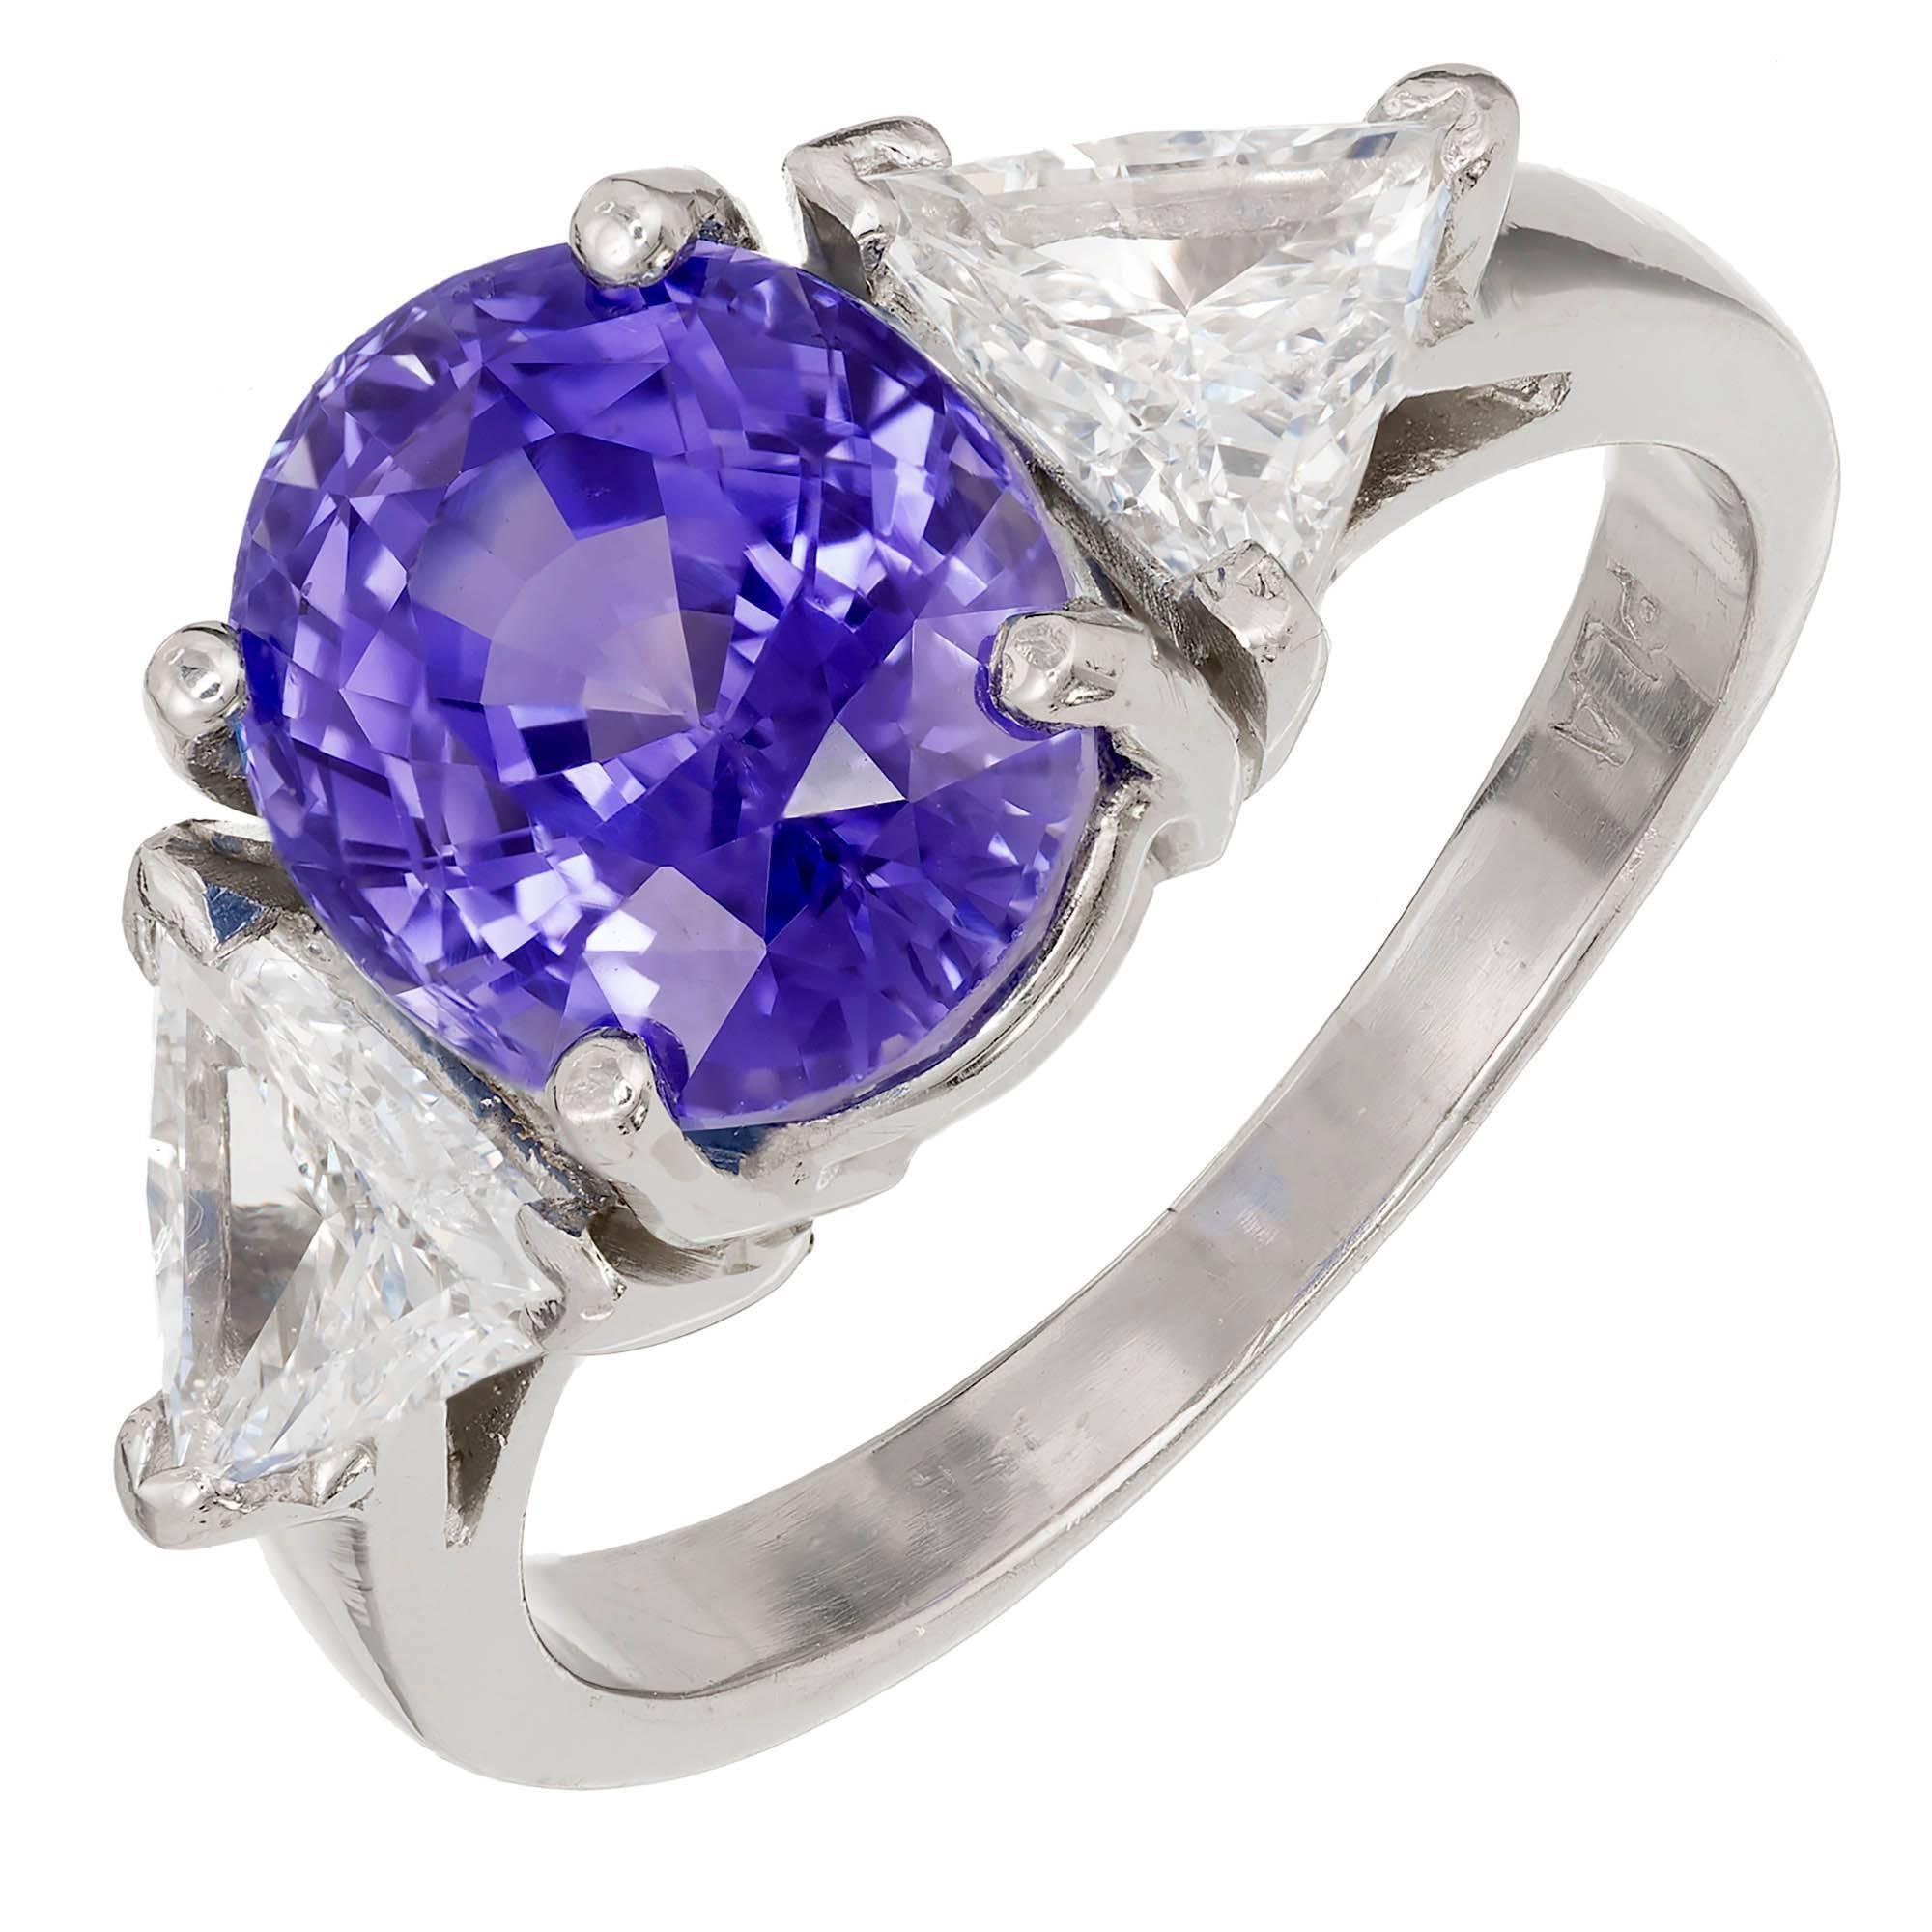 AGL Certified 5.17 Carat Natural Sapphire Diamond Platinum Engagement Ring